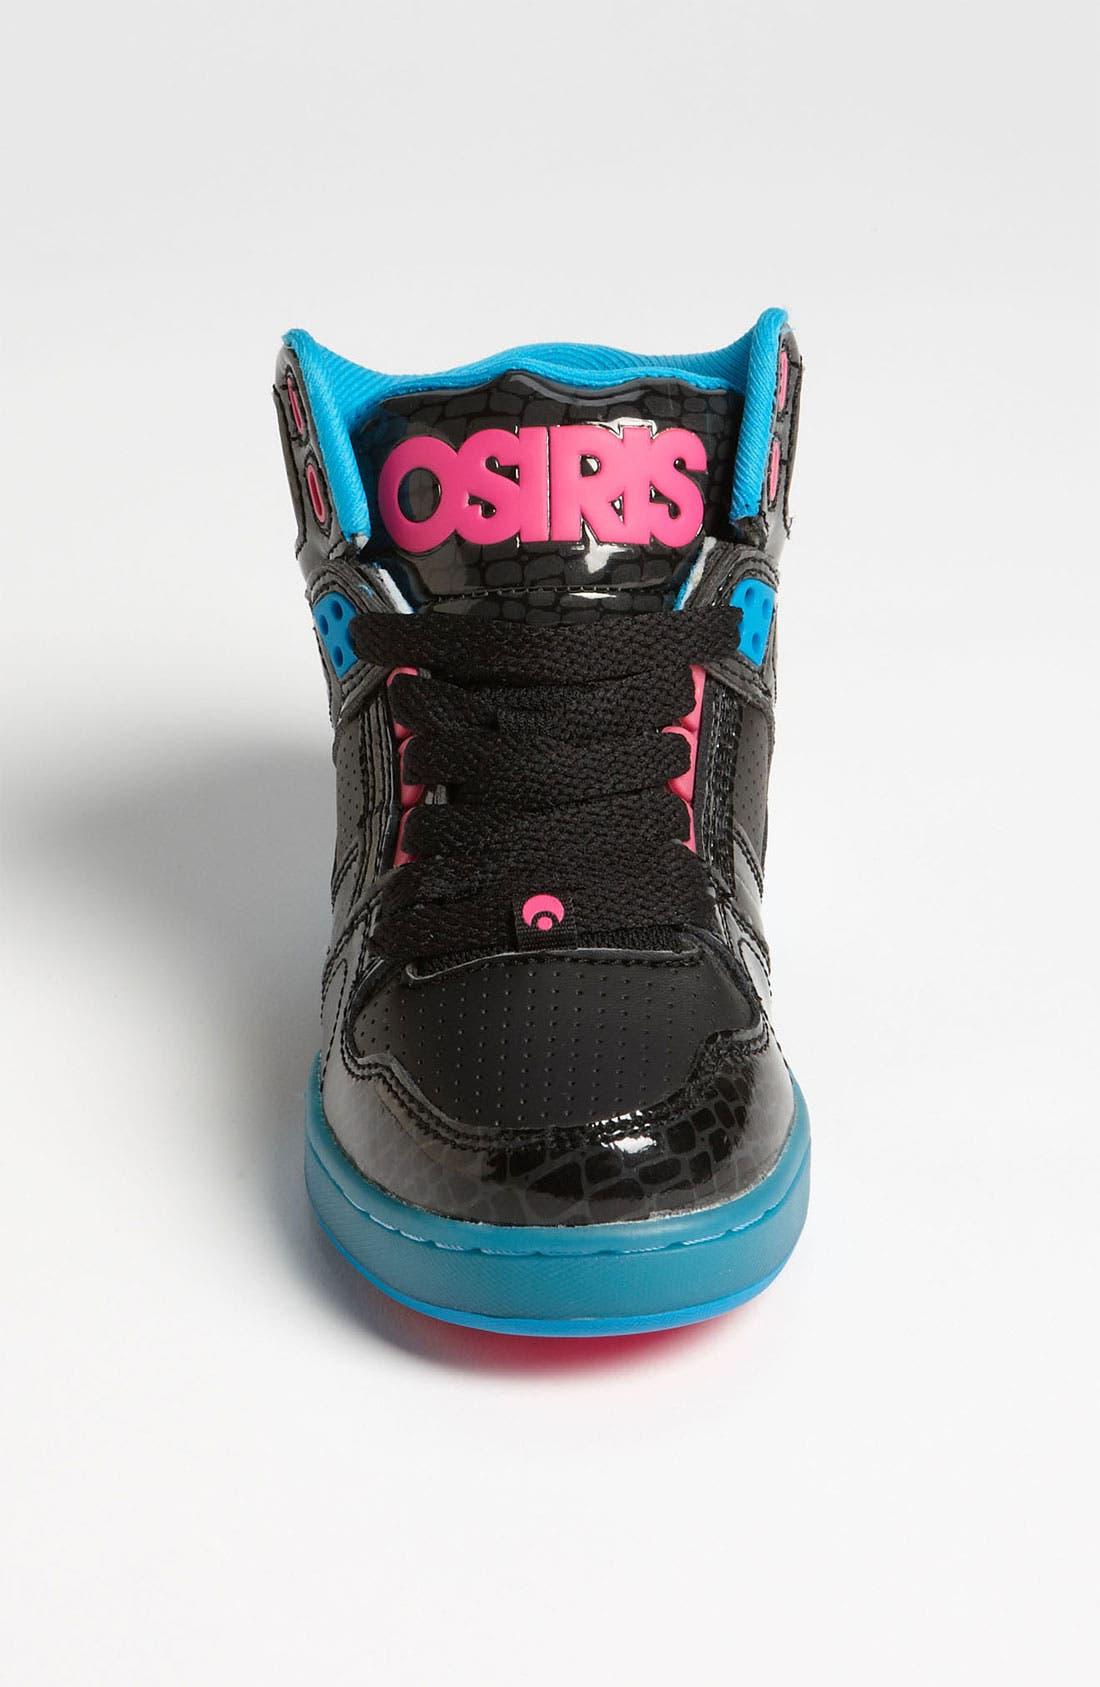 Alternate Image 3  - Osiris 'NYC 83 Slim' Sneaker (Toddler, Little Kid & Big Kid)